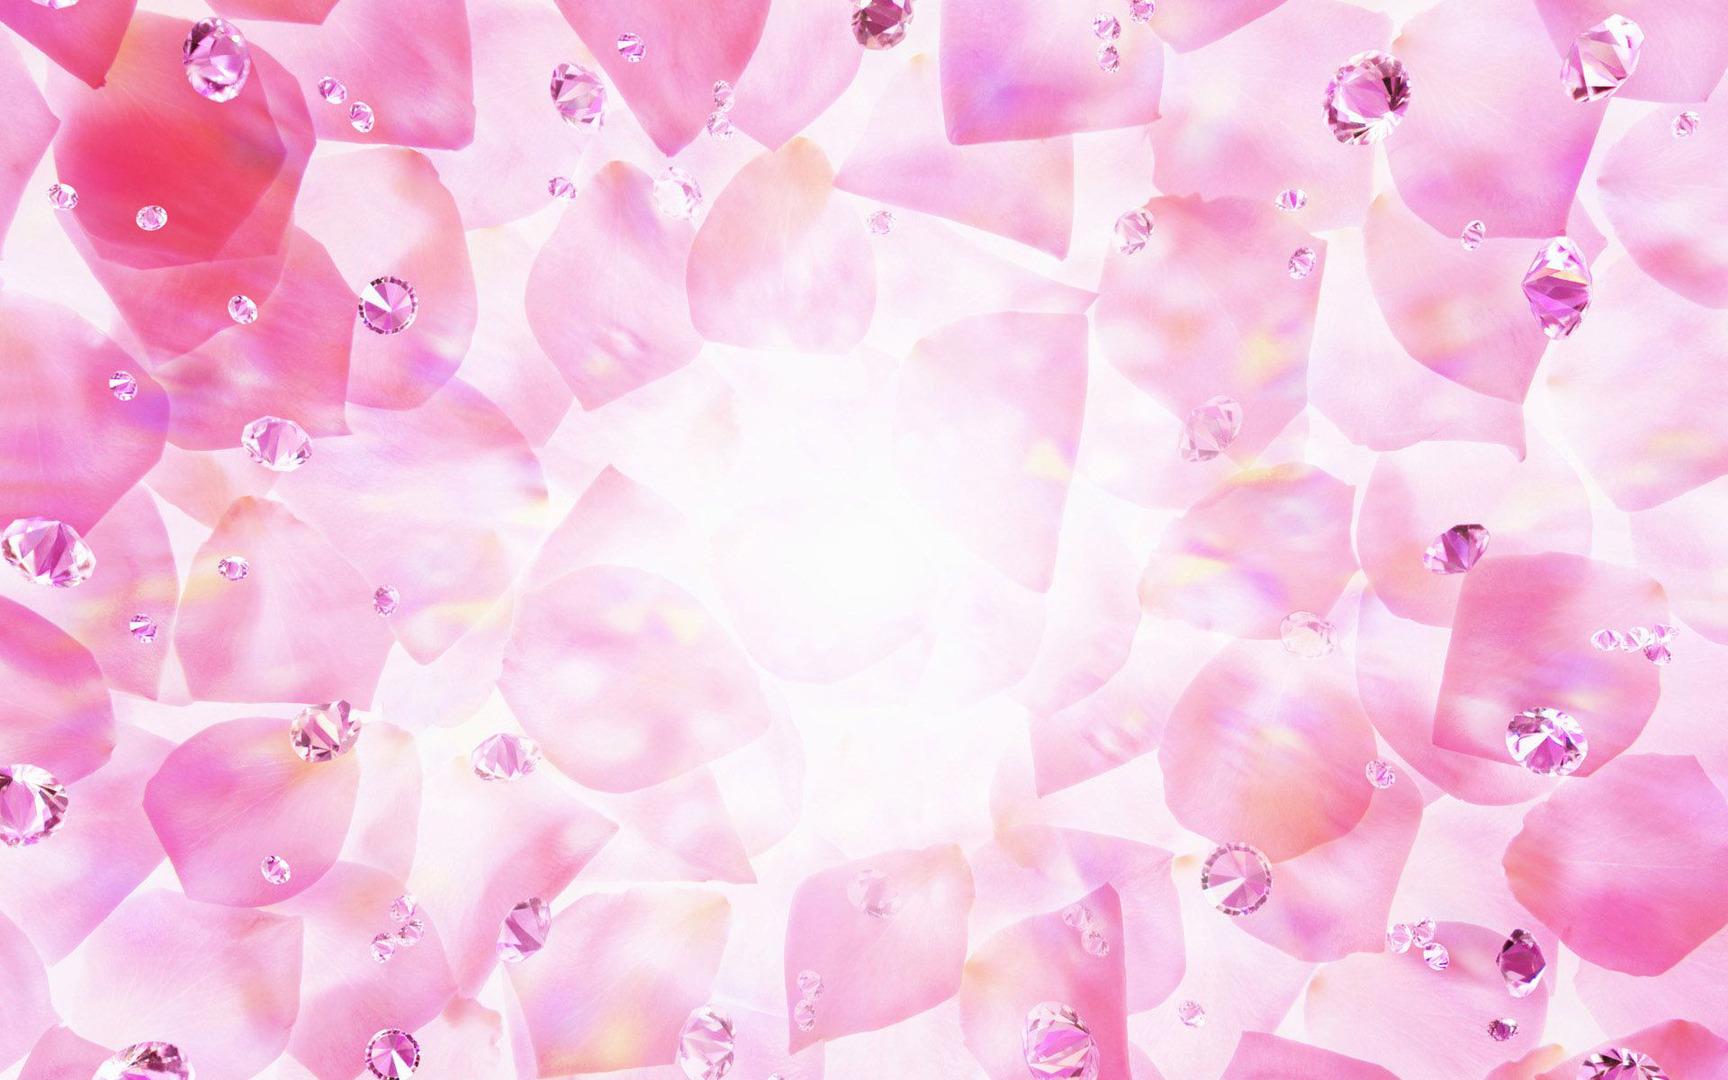 3690184 1080p pink rose petals rpnation - Red rose petals wallpaper ...